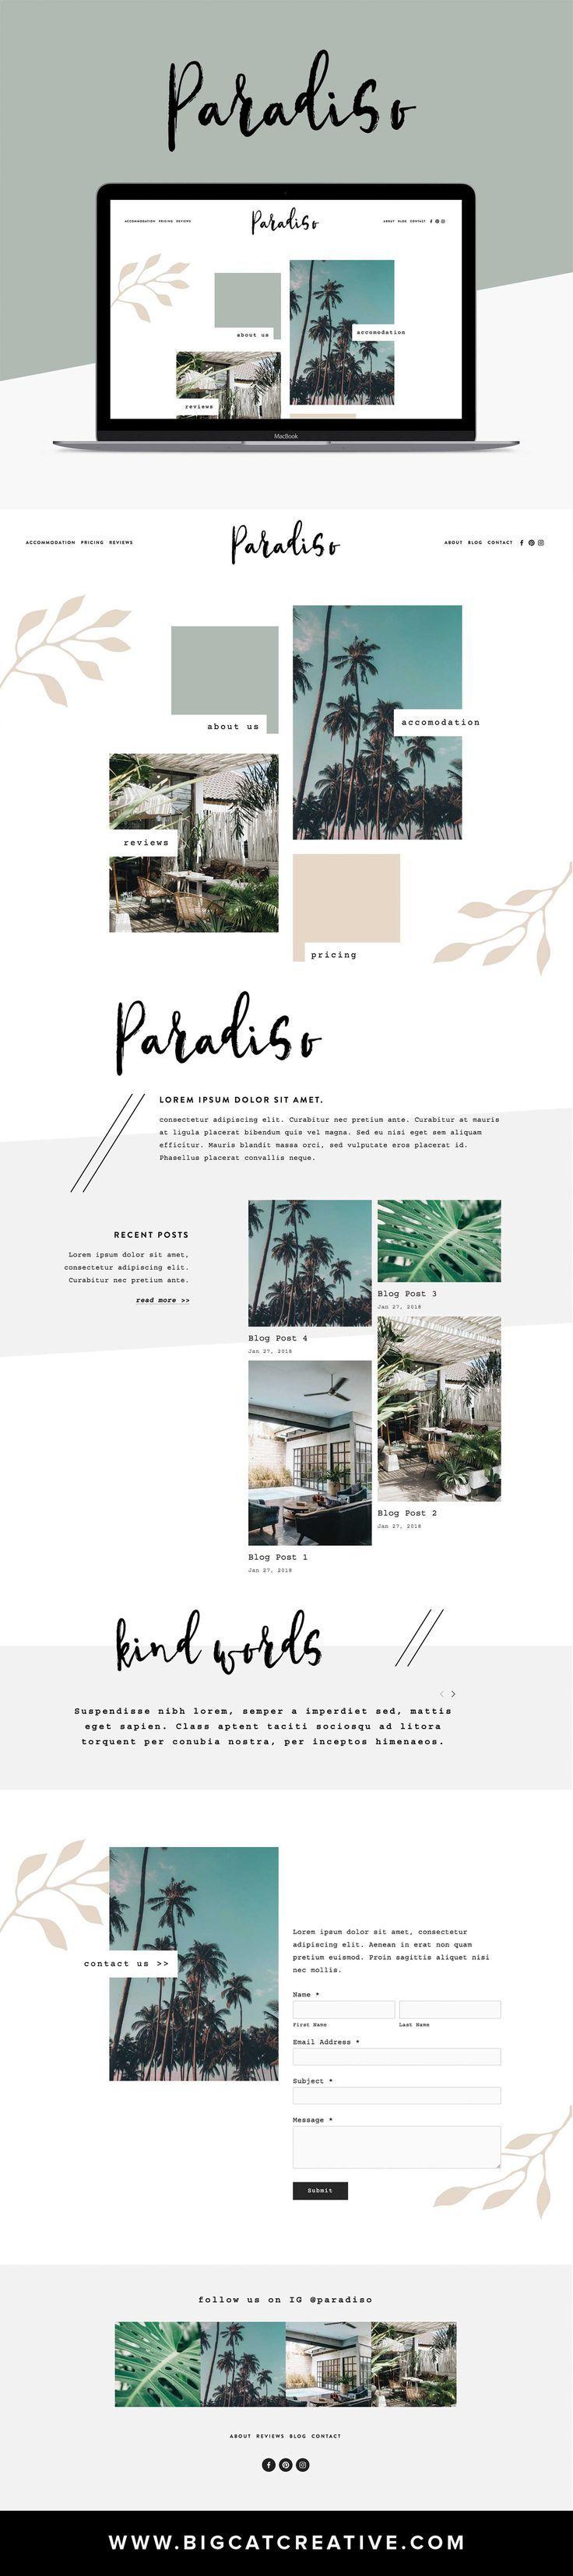 paradiso squarespace template kit digital resources. Black Bedroom Furniture Sets. Home Design Ideas